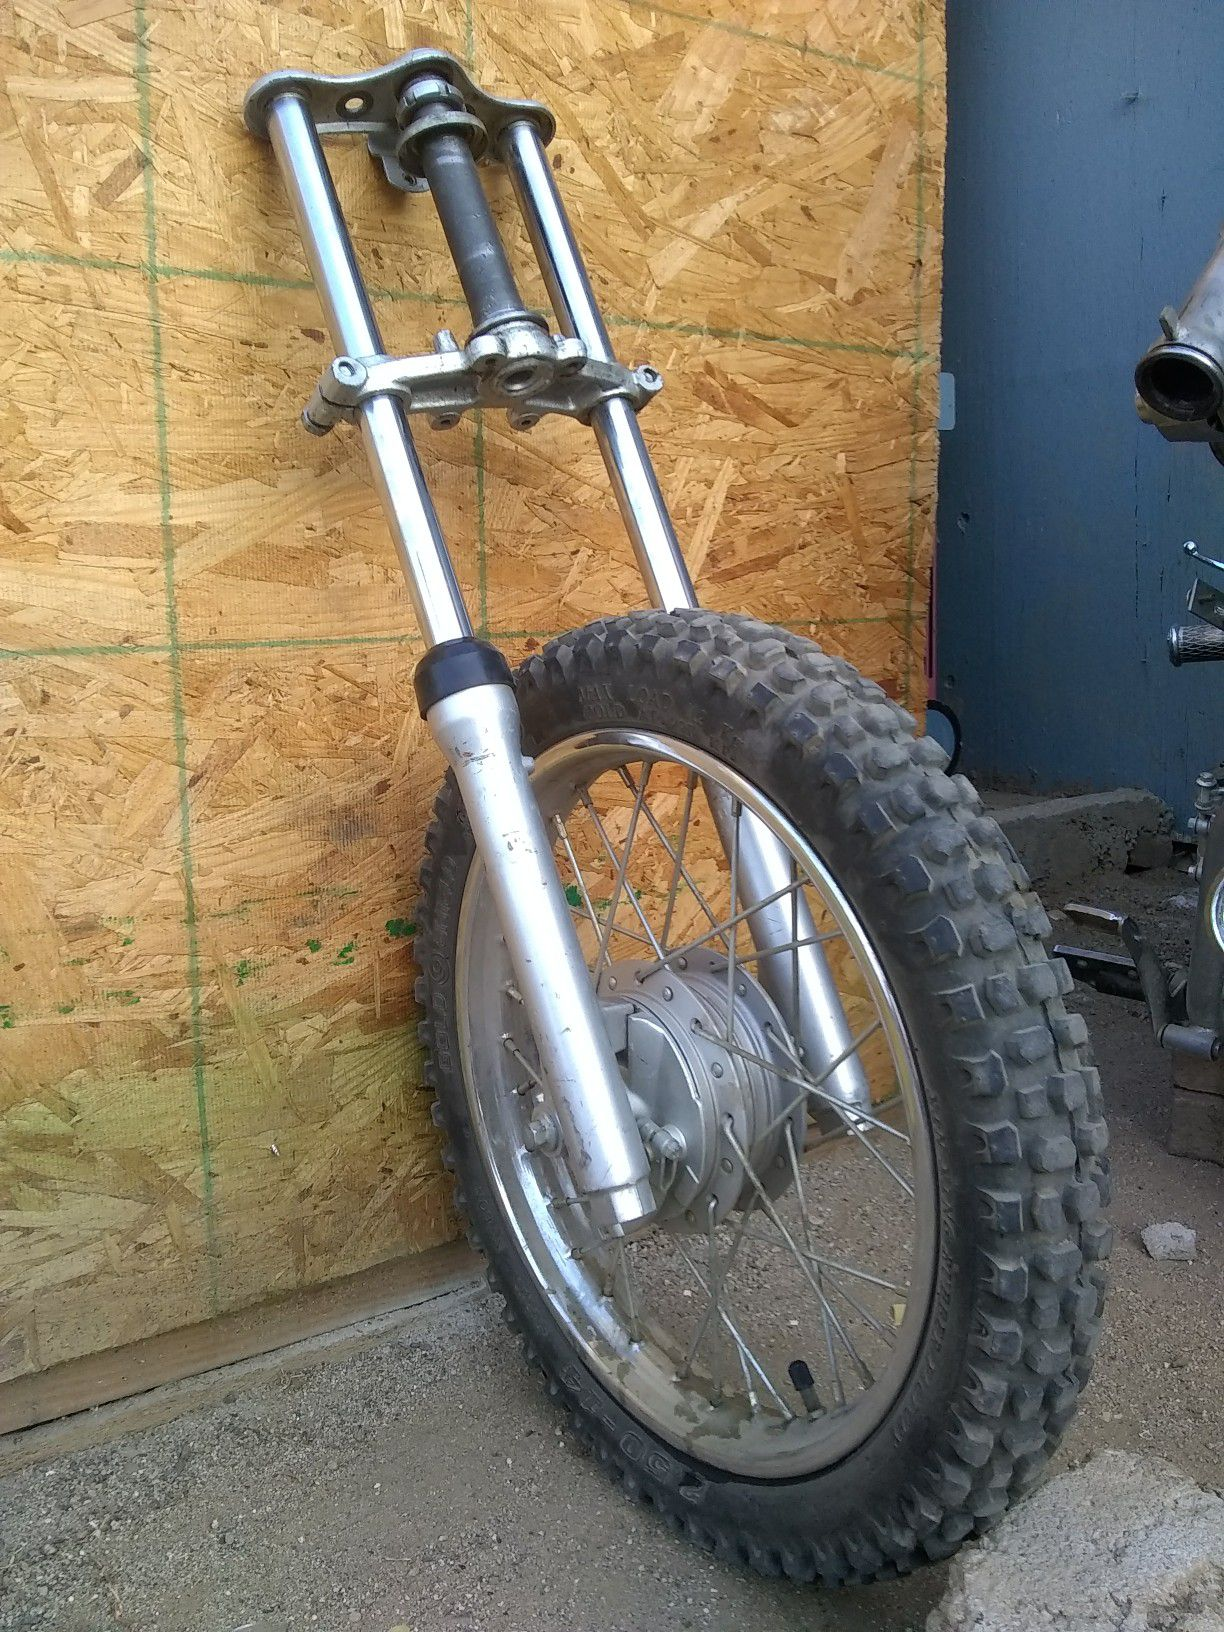 Pit bike front end